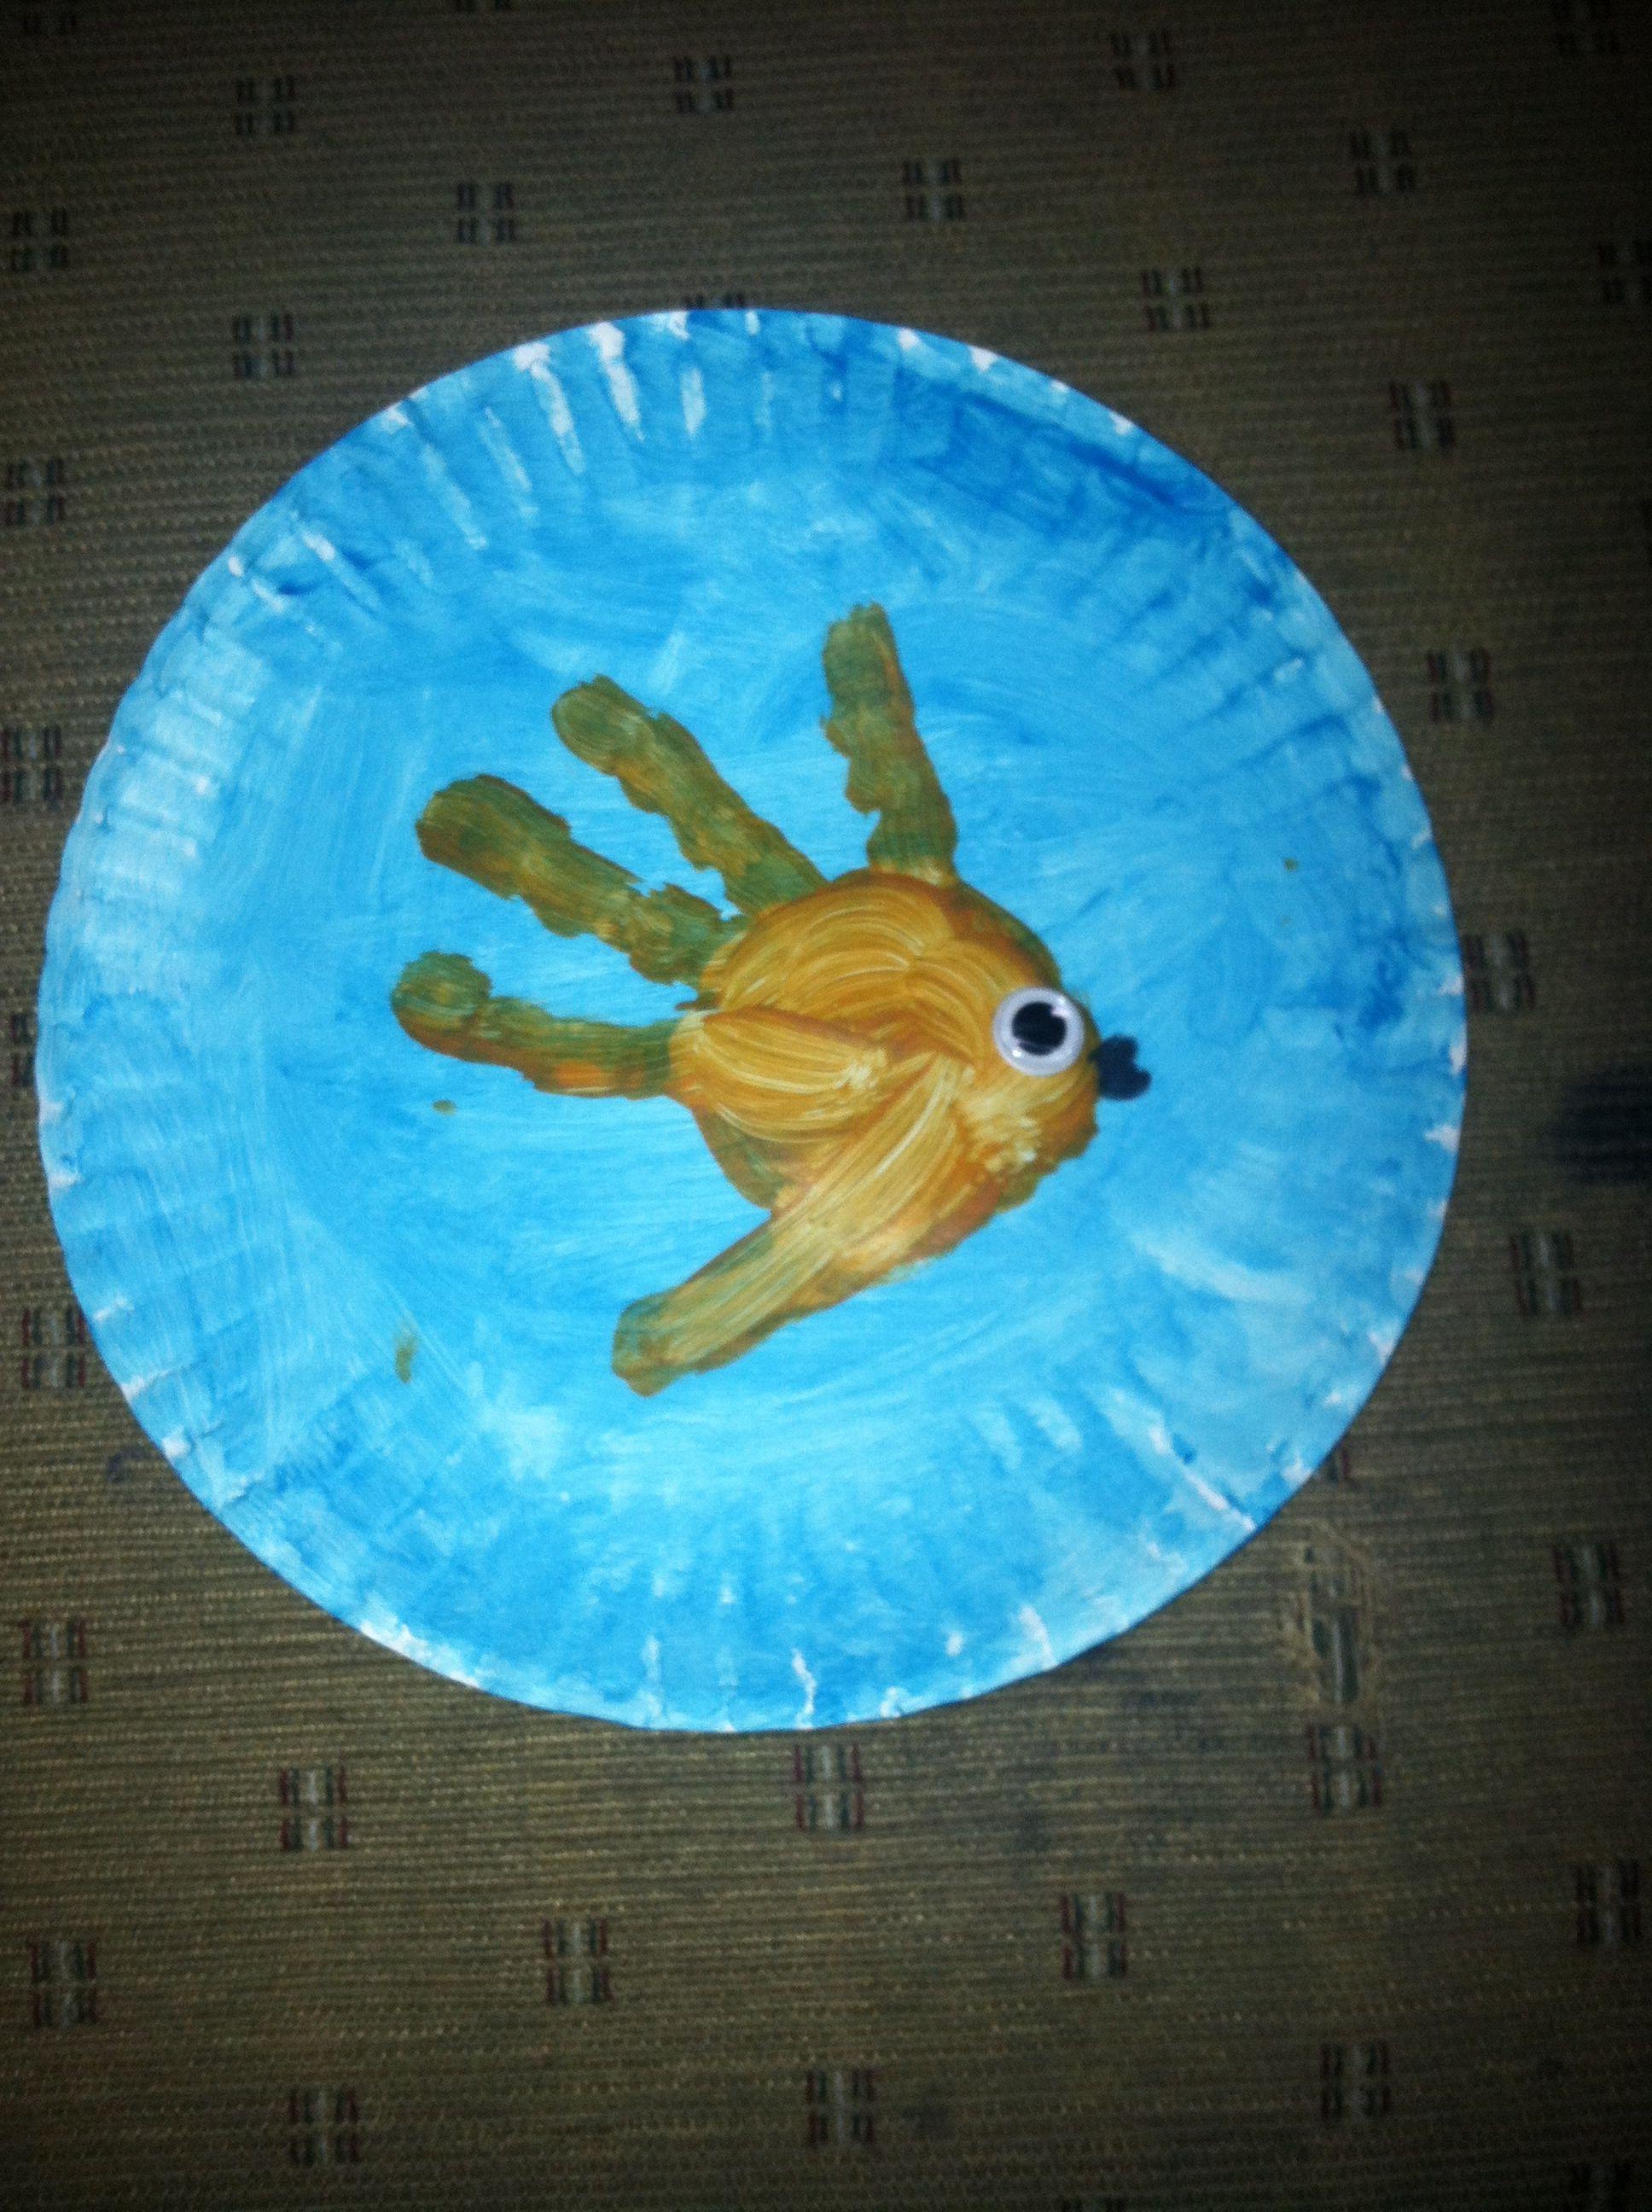 Preschool craft: Fish in it's fish bowl | Preschool crafts ...